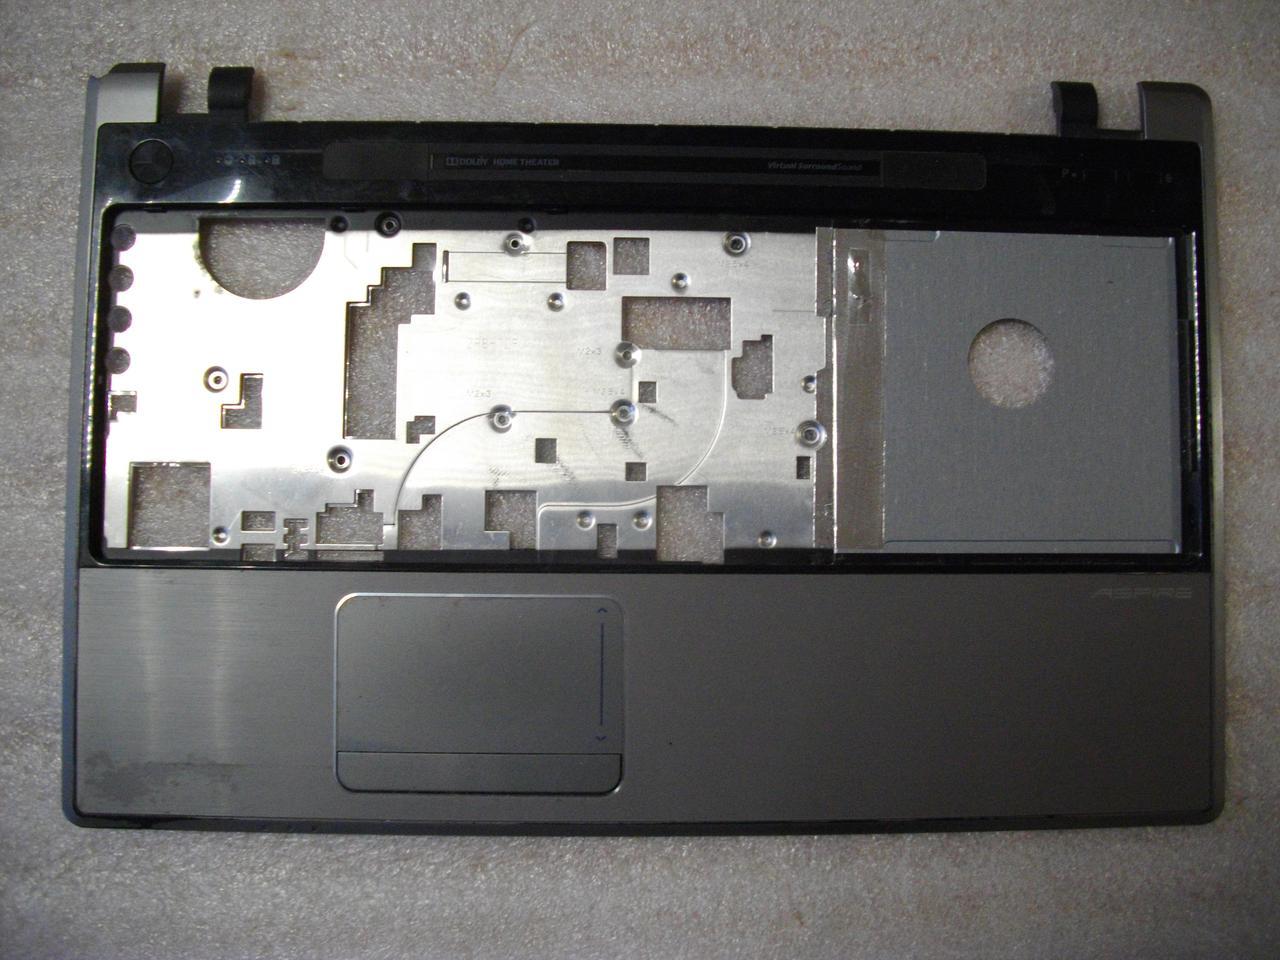 Корпус. Каркас Средняя часть, верхняя часть корпуса с тачпадом Acer Aspire 5553, 5553G